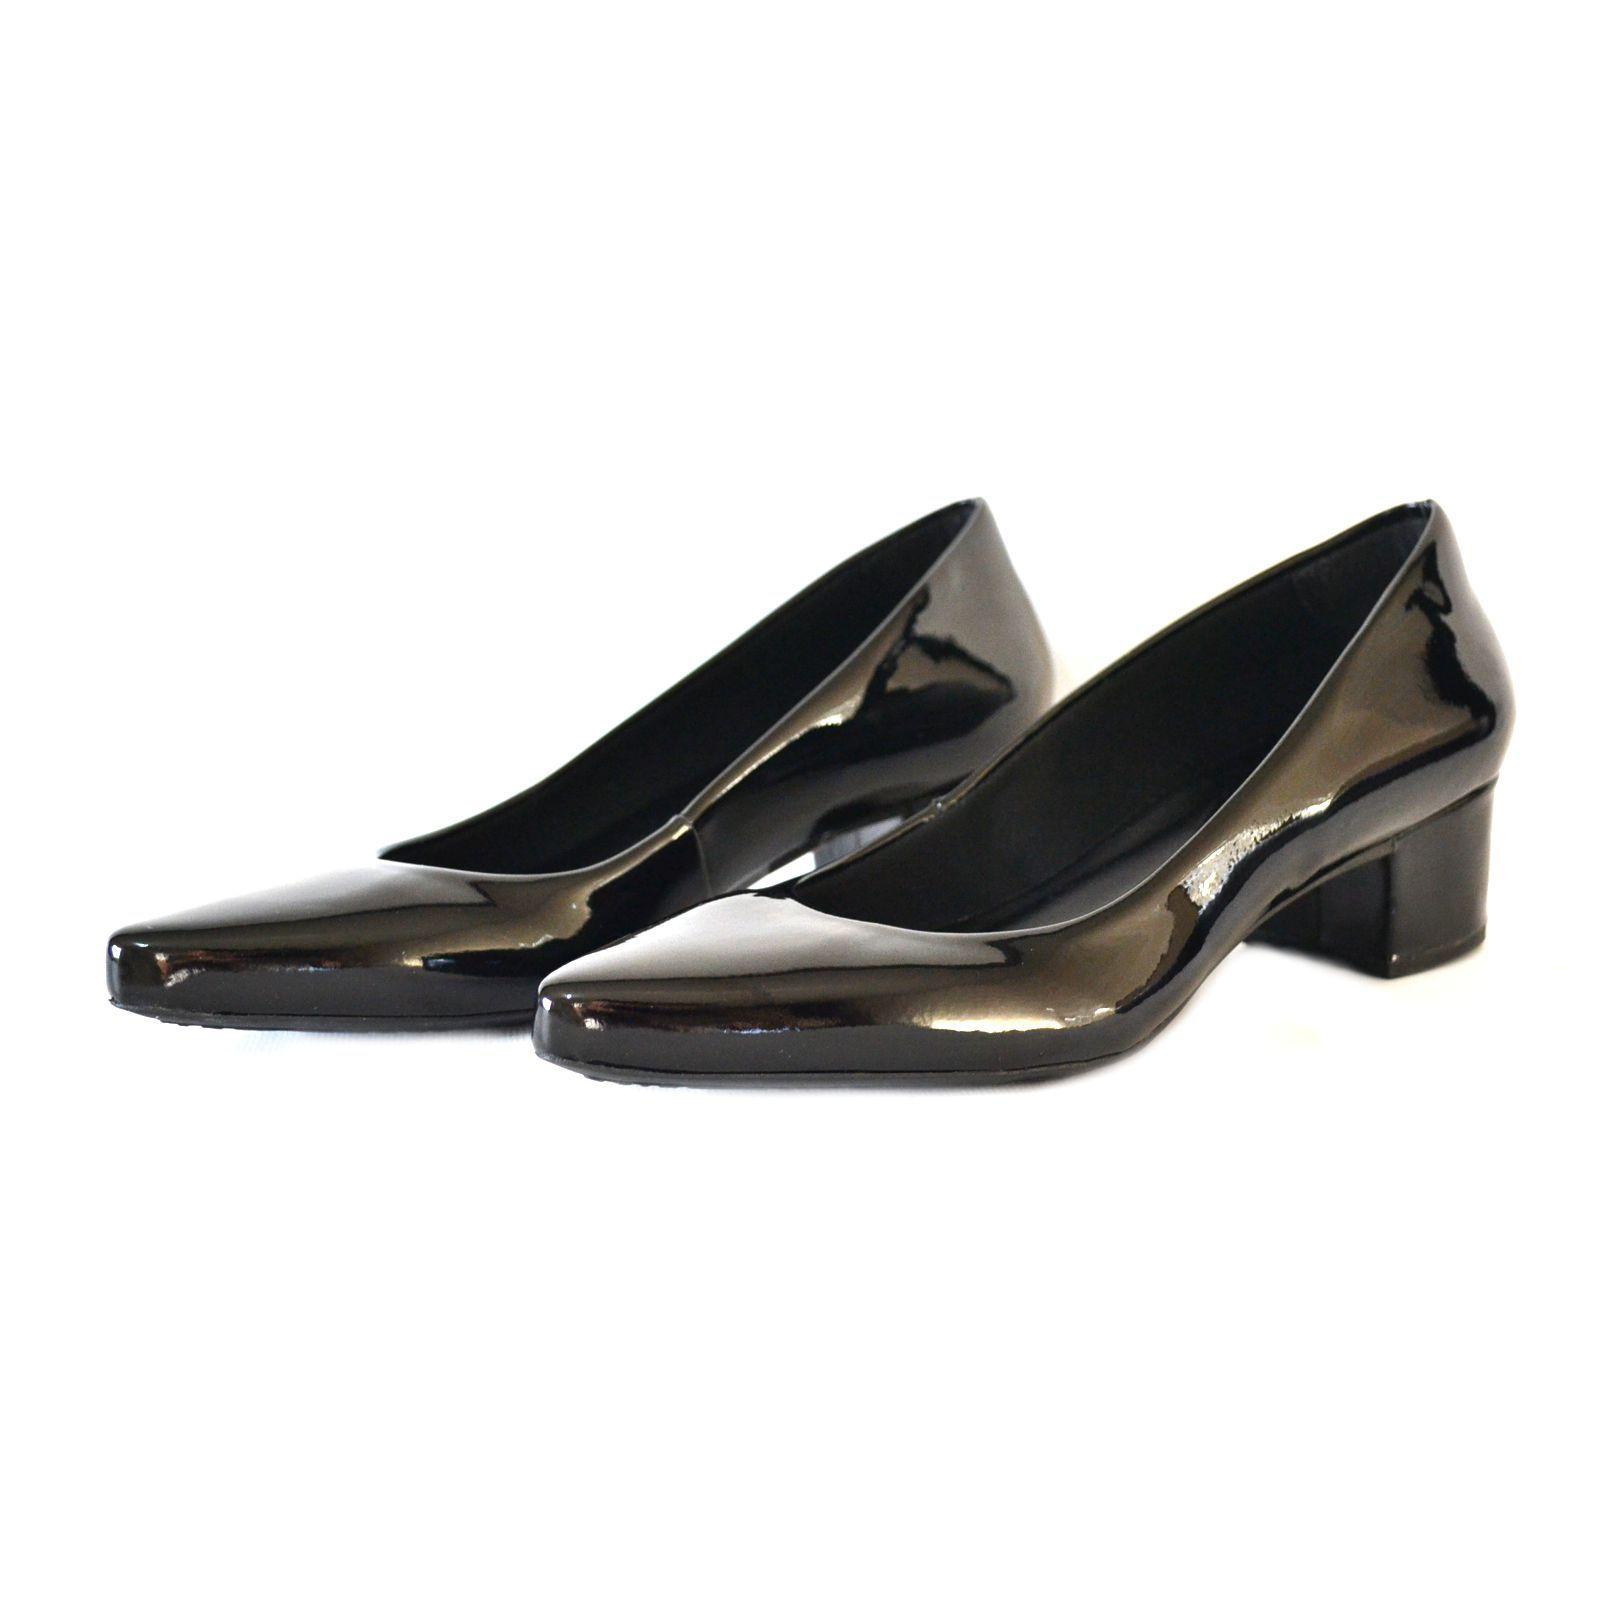 Sapato Feminino   Prata Couro 1009802 Preto/Verniz